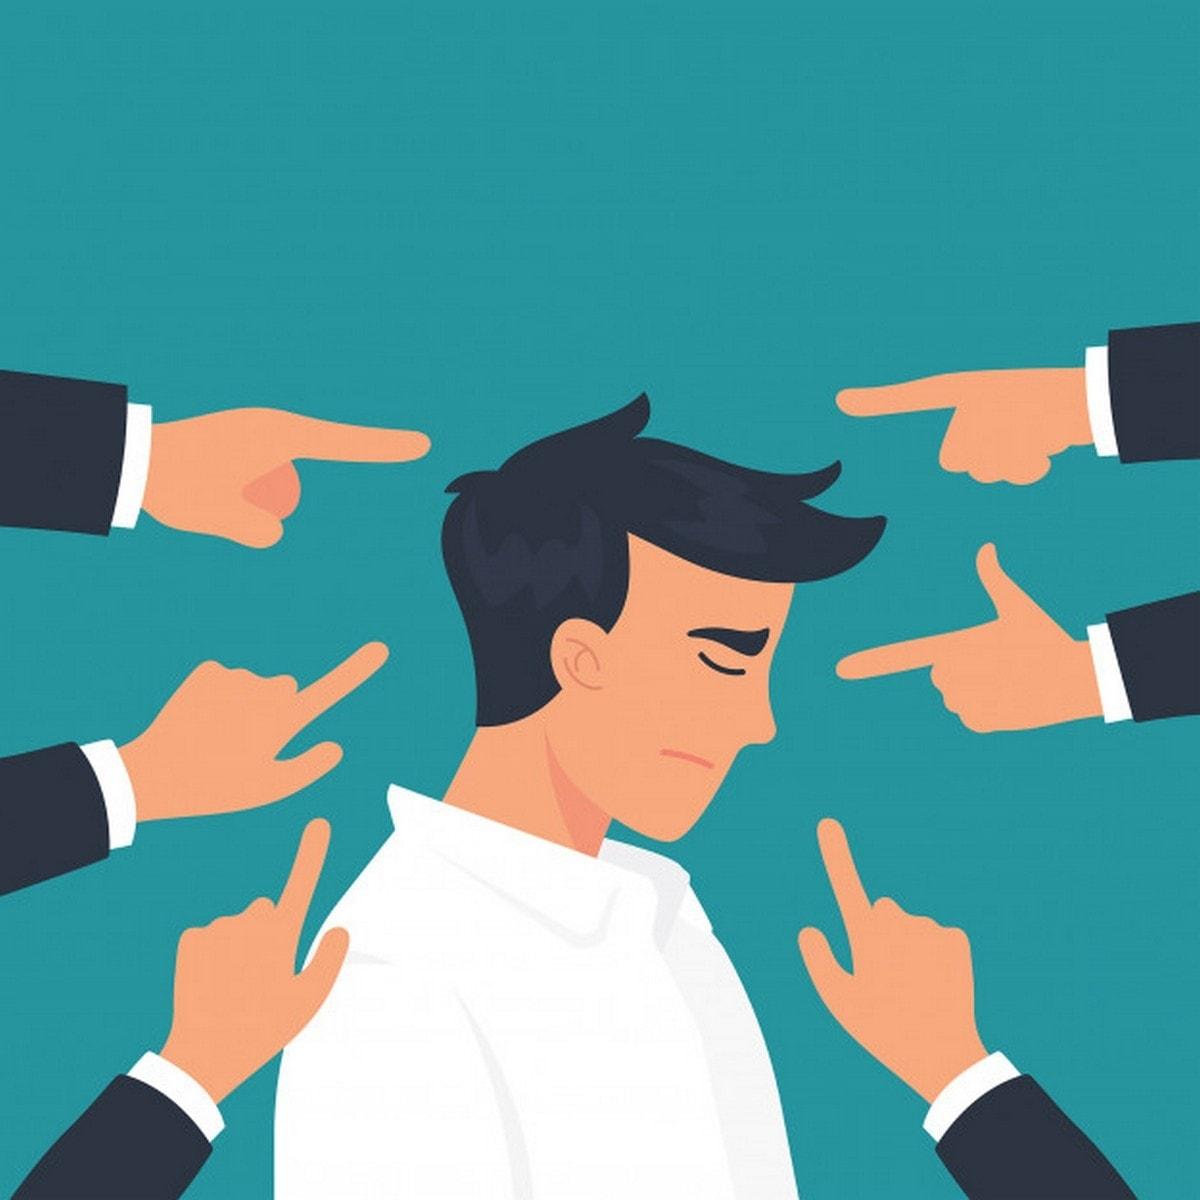 Employee Discrimination - 4